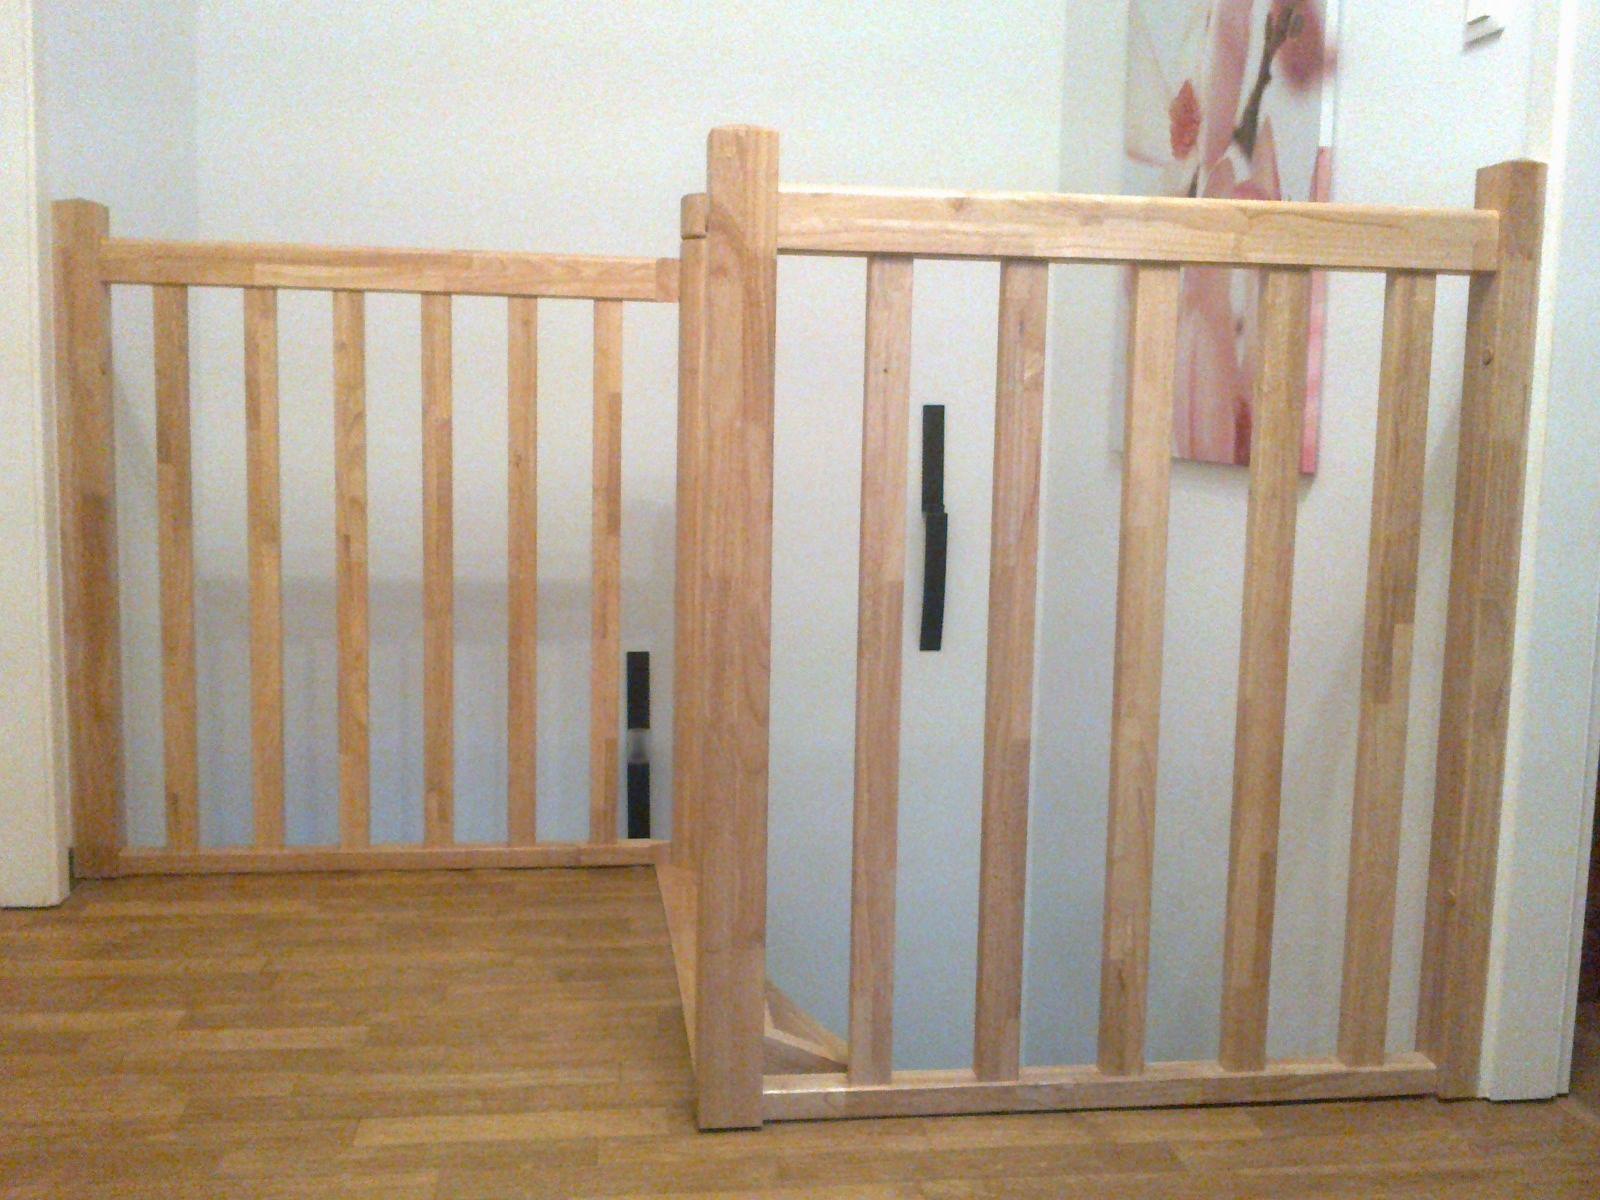 escaliers magnin garde corps d tage. Black Bedroom Furniture Sets. Home Design Ideas